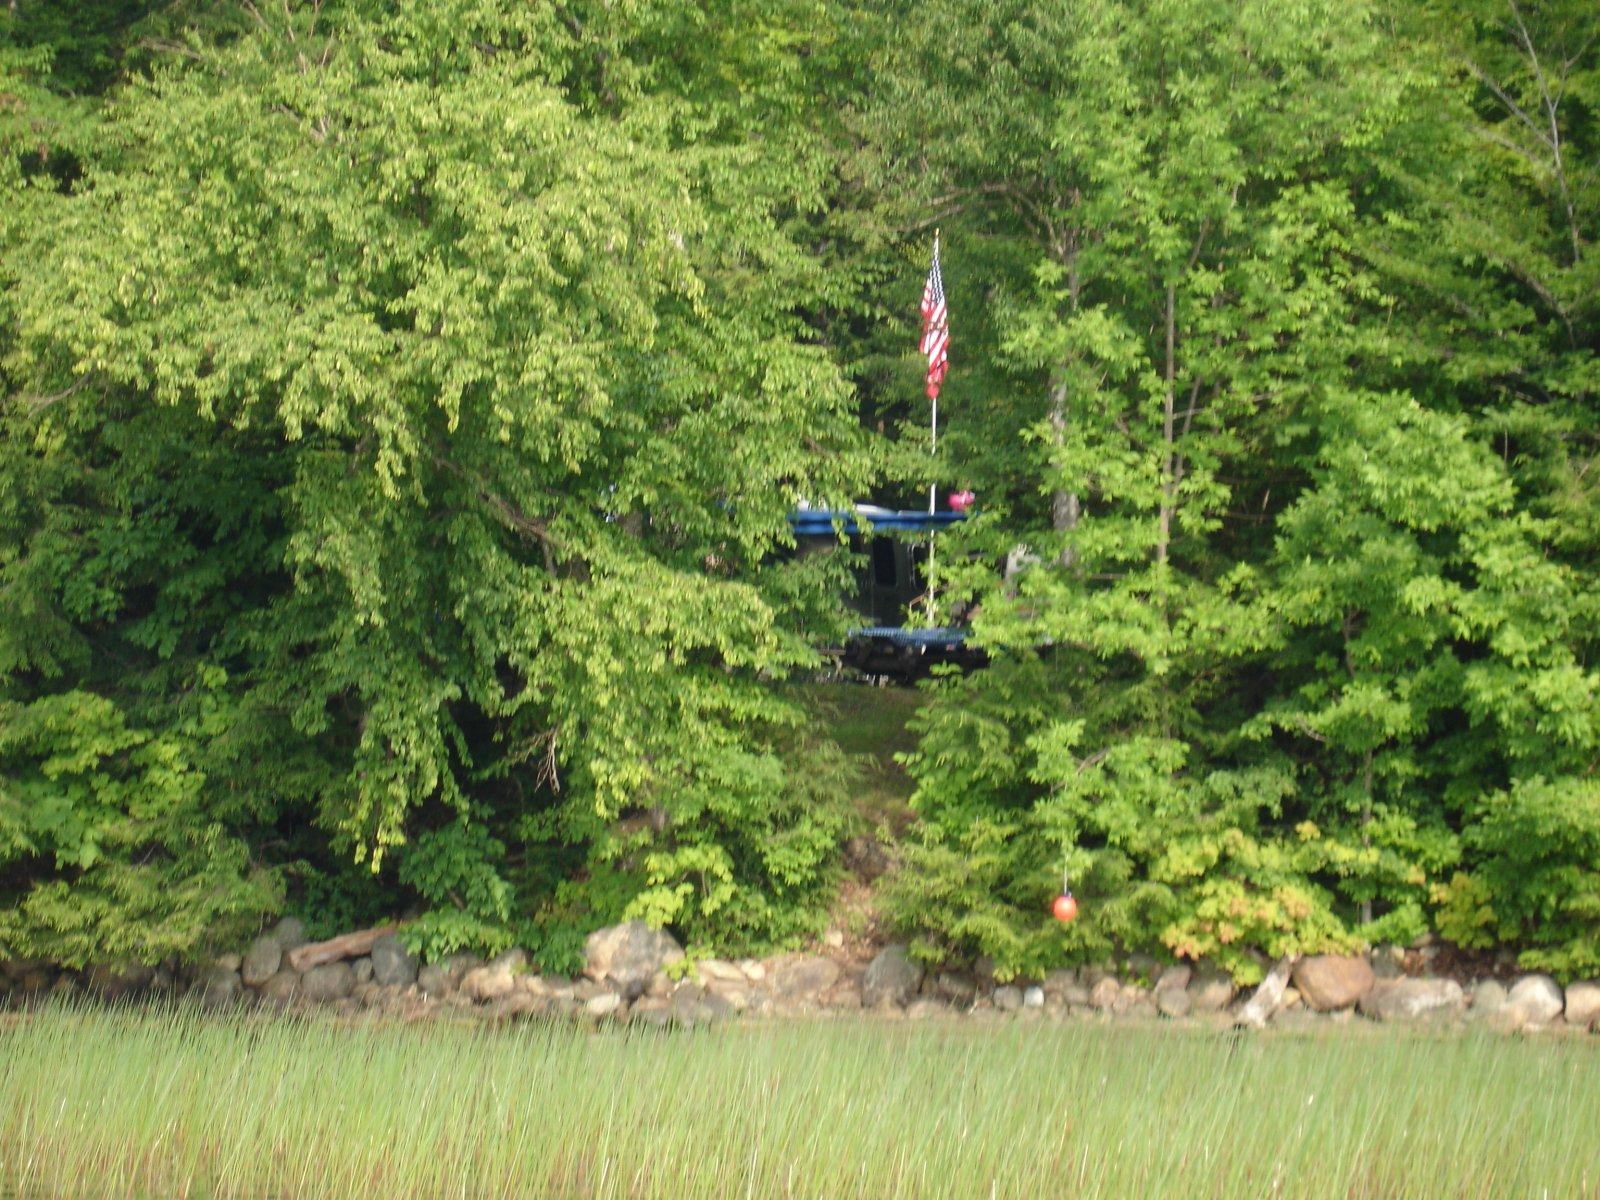 Click image for larger version  Name:Piseco Lake JulyAug 2009 105.jpg Views:93 Size:470.1 KB ID:85866